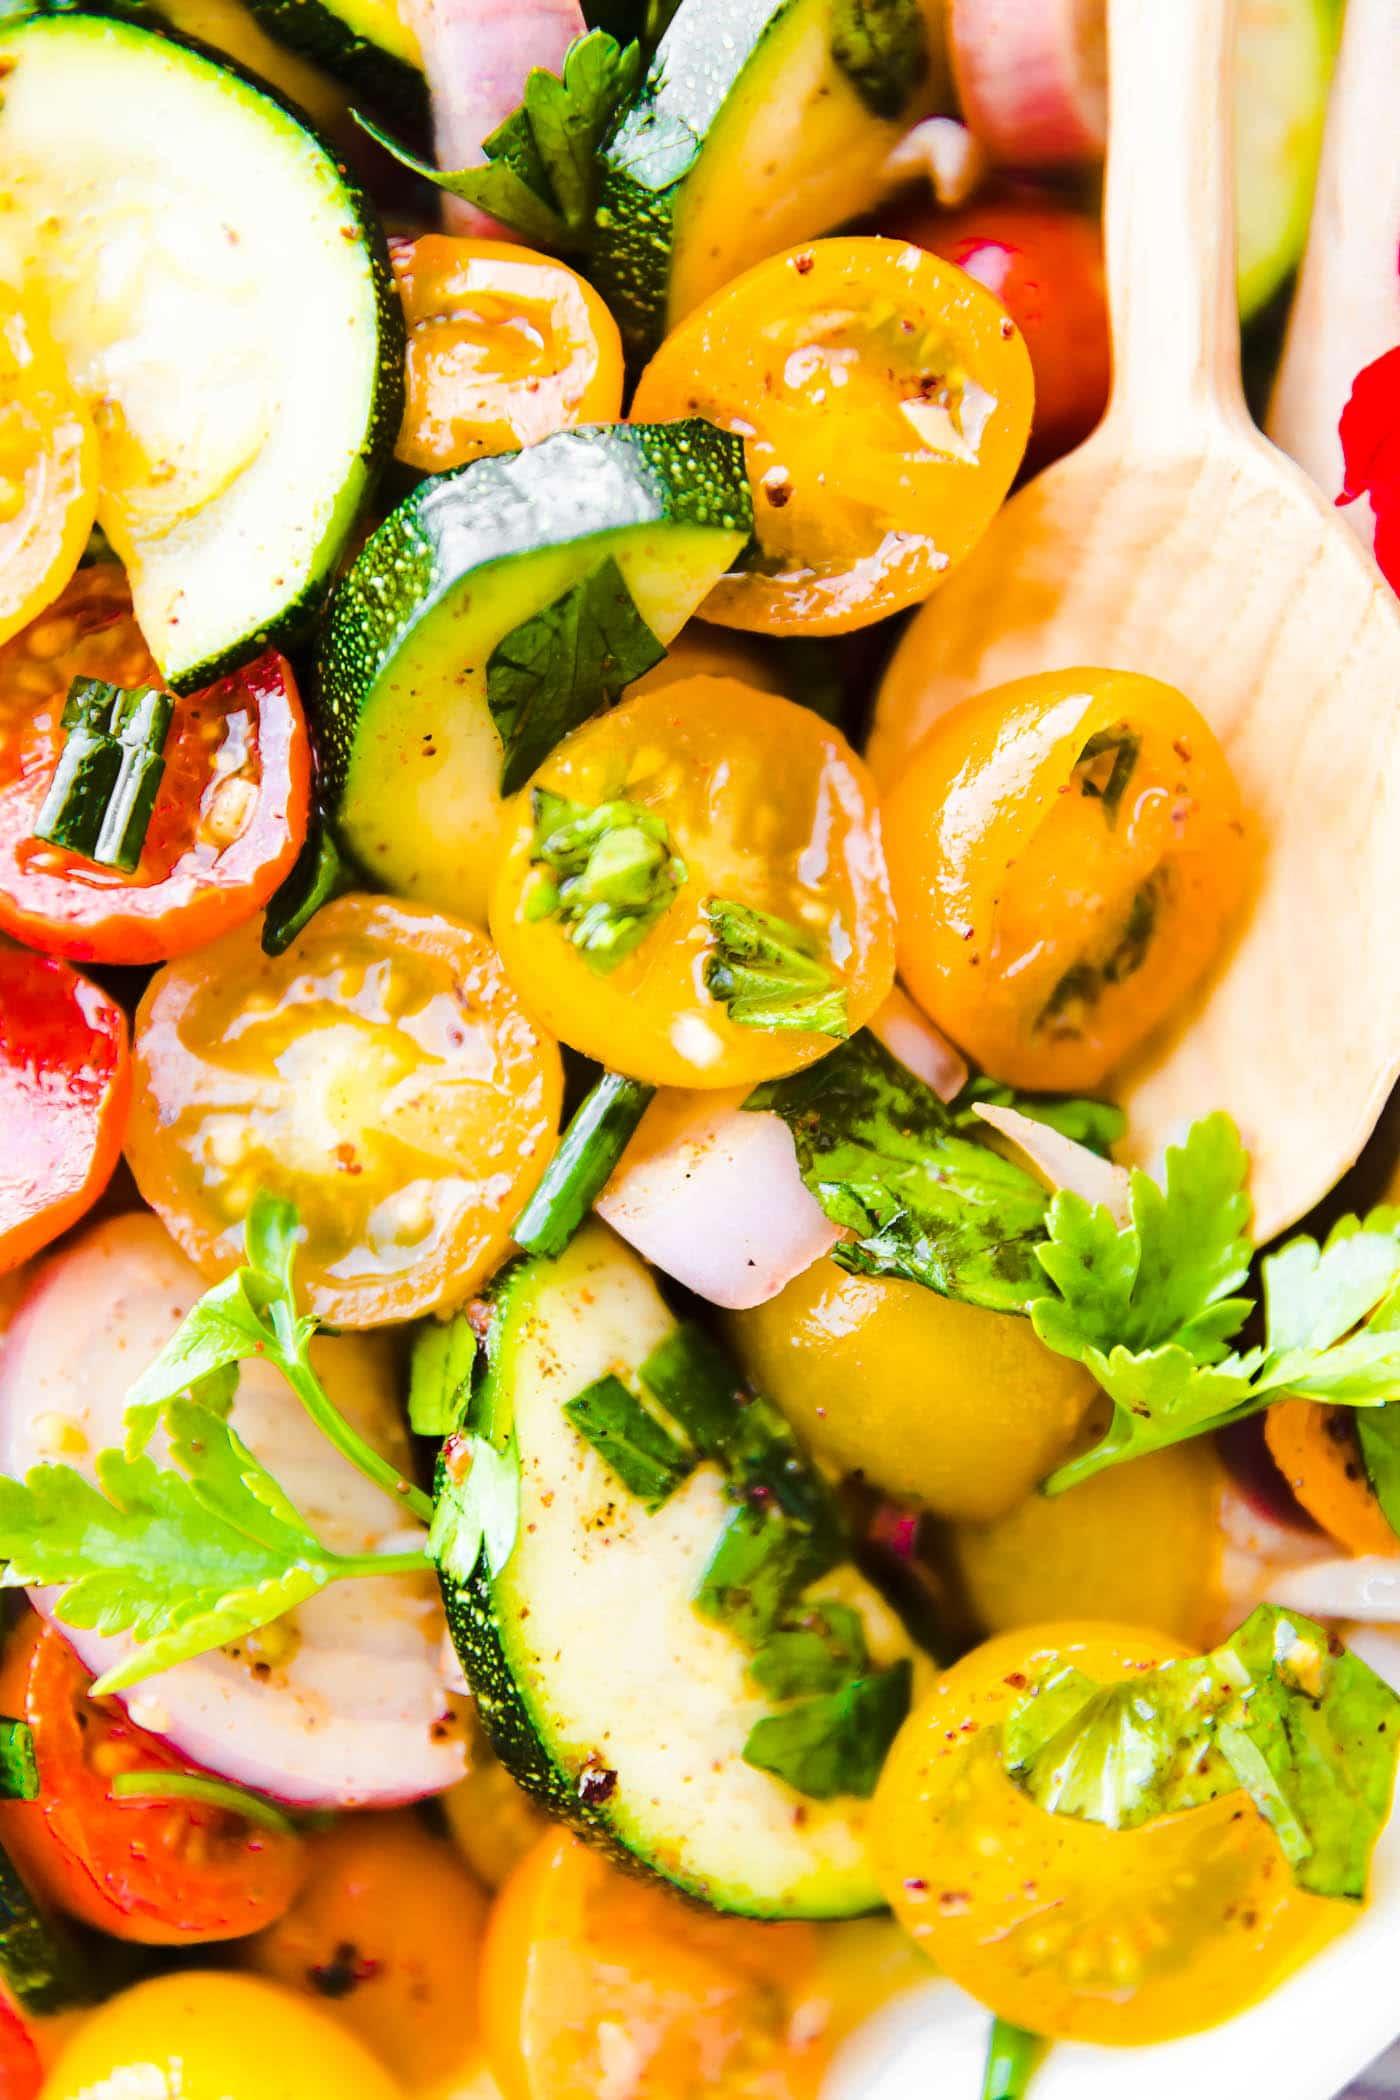 Close up image of tomato zucchini salad